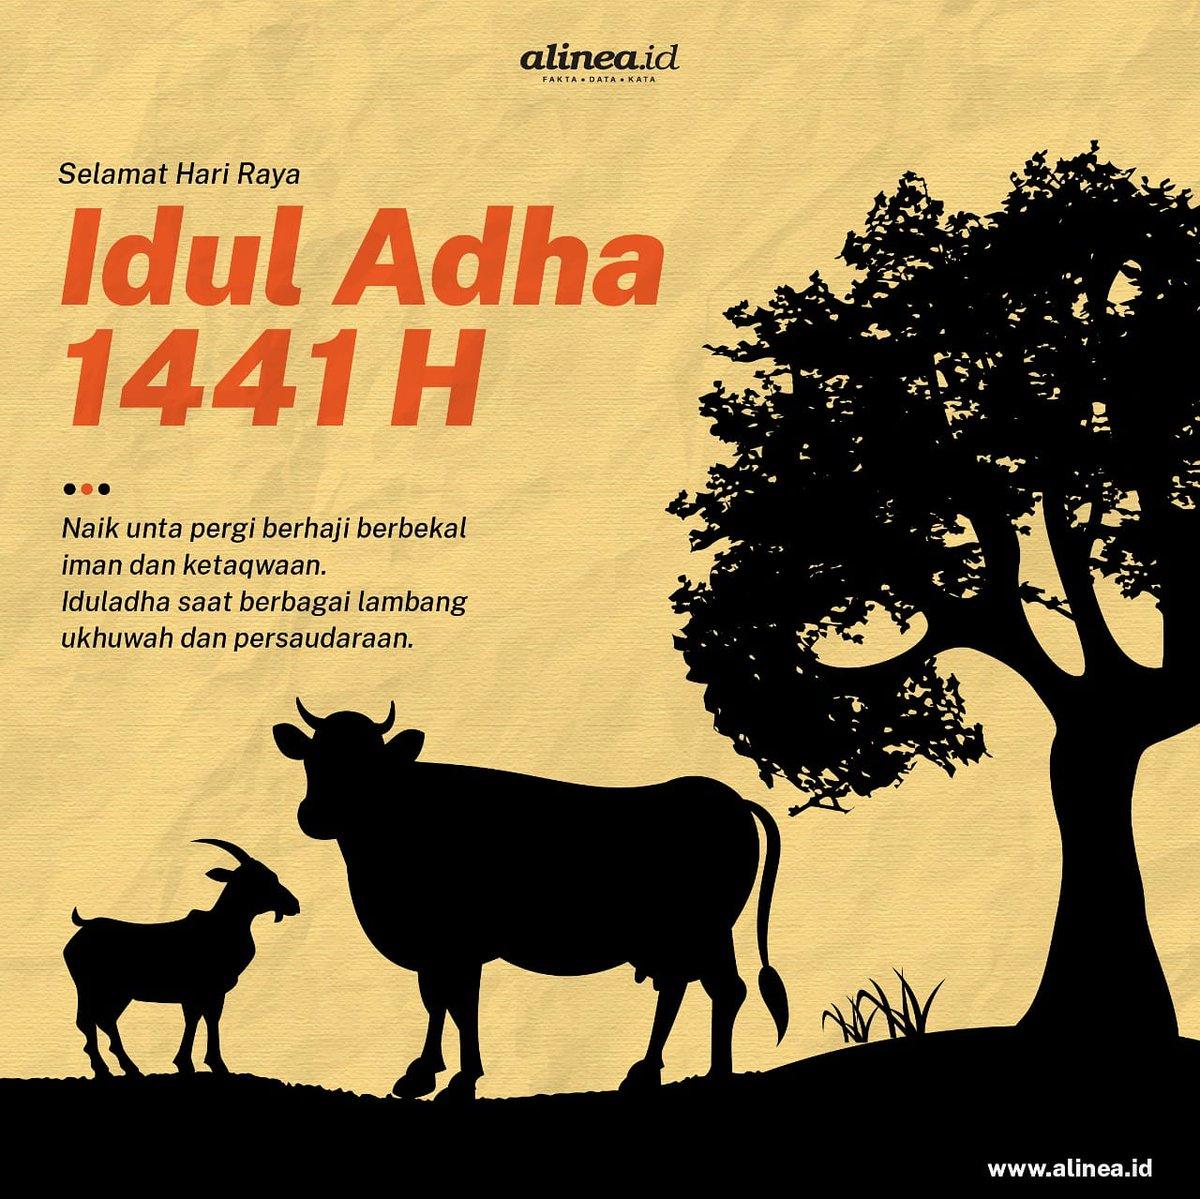 Alineadotid Twitterren Selamat Hari Raya Iduladha 1441 H Bagi Teman Alinea Yang Beragama Islam Semoga Di Hari Yang Suci Ini Membuat Hati Kita Semakin Ikhlas Menerima Semua Cobaan Di Masa Masa Terberat Seperti